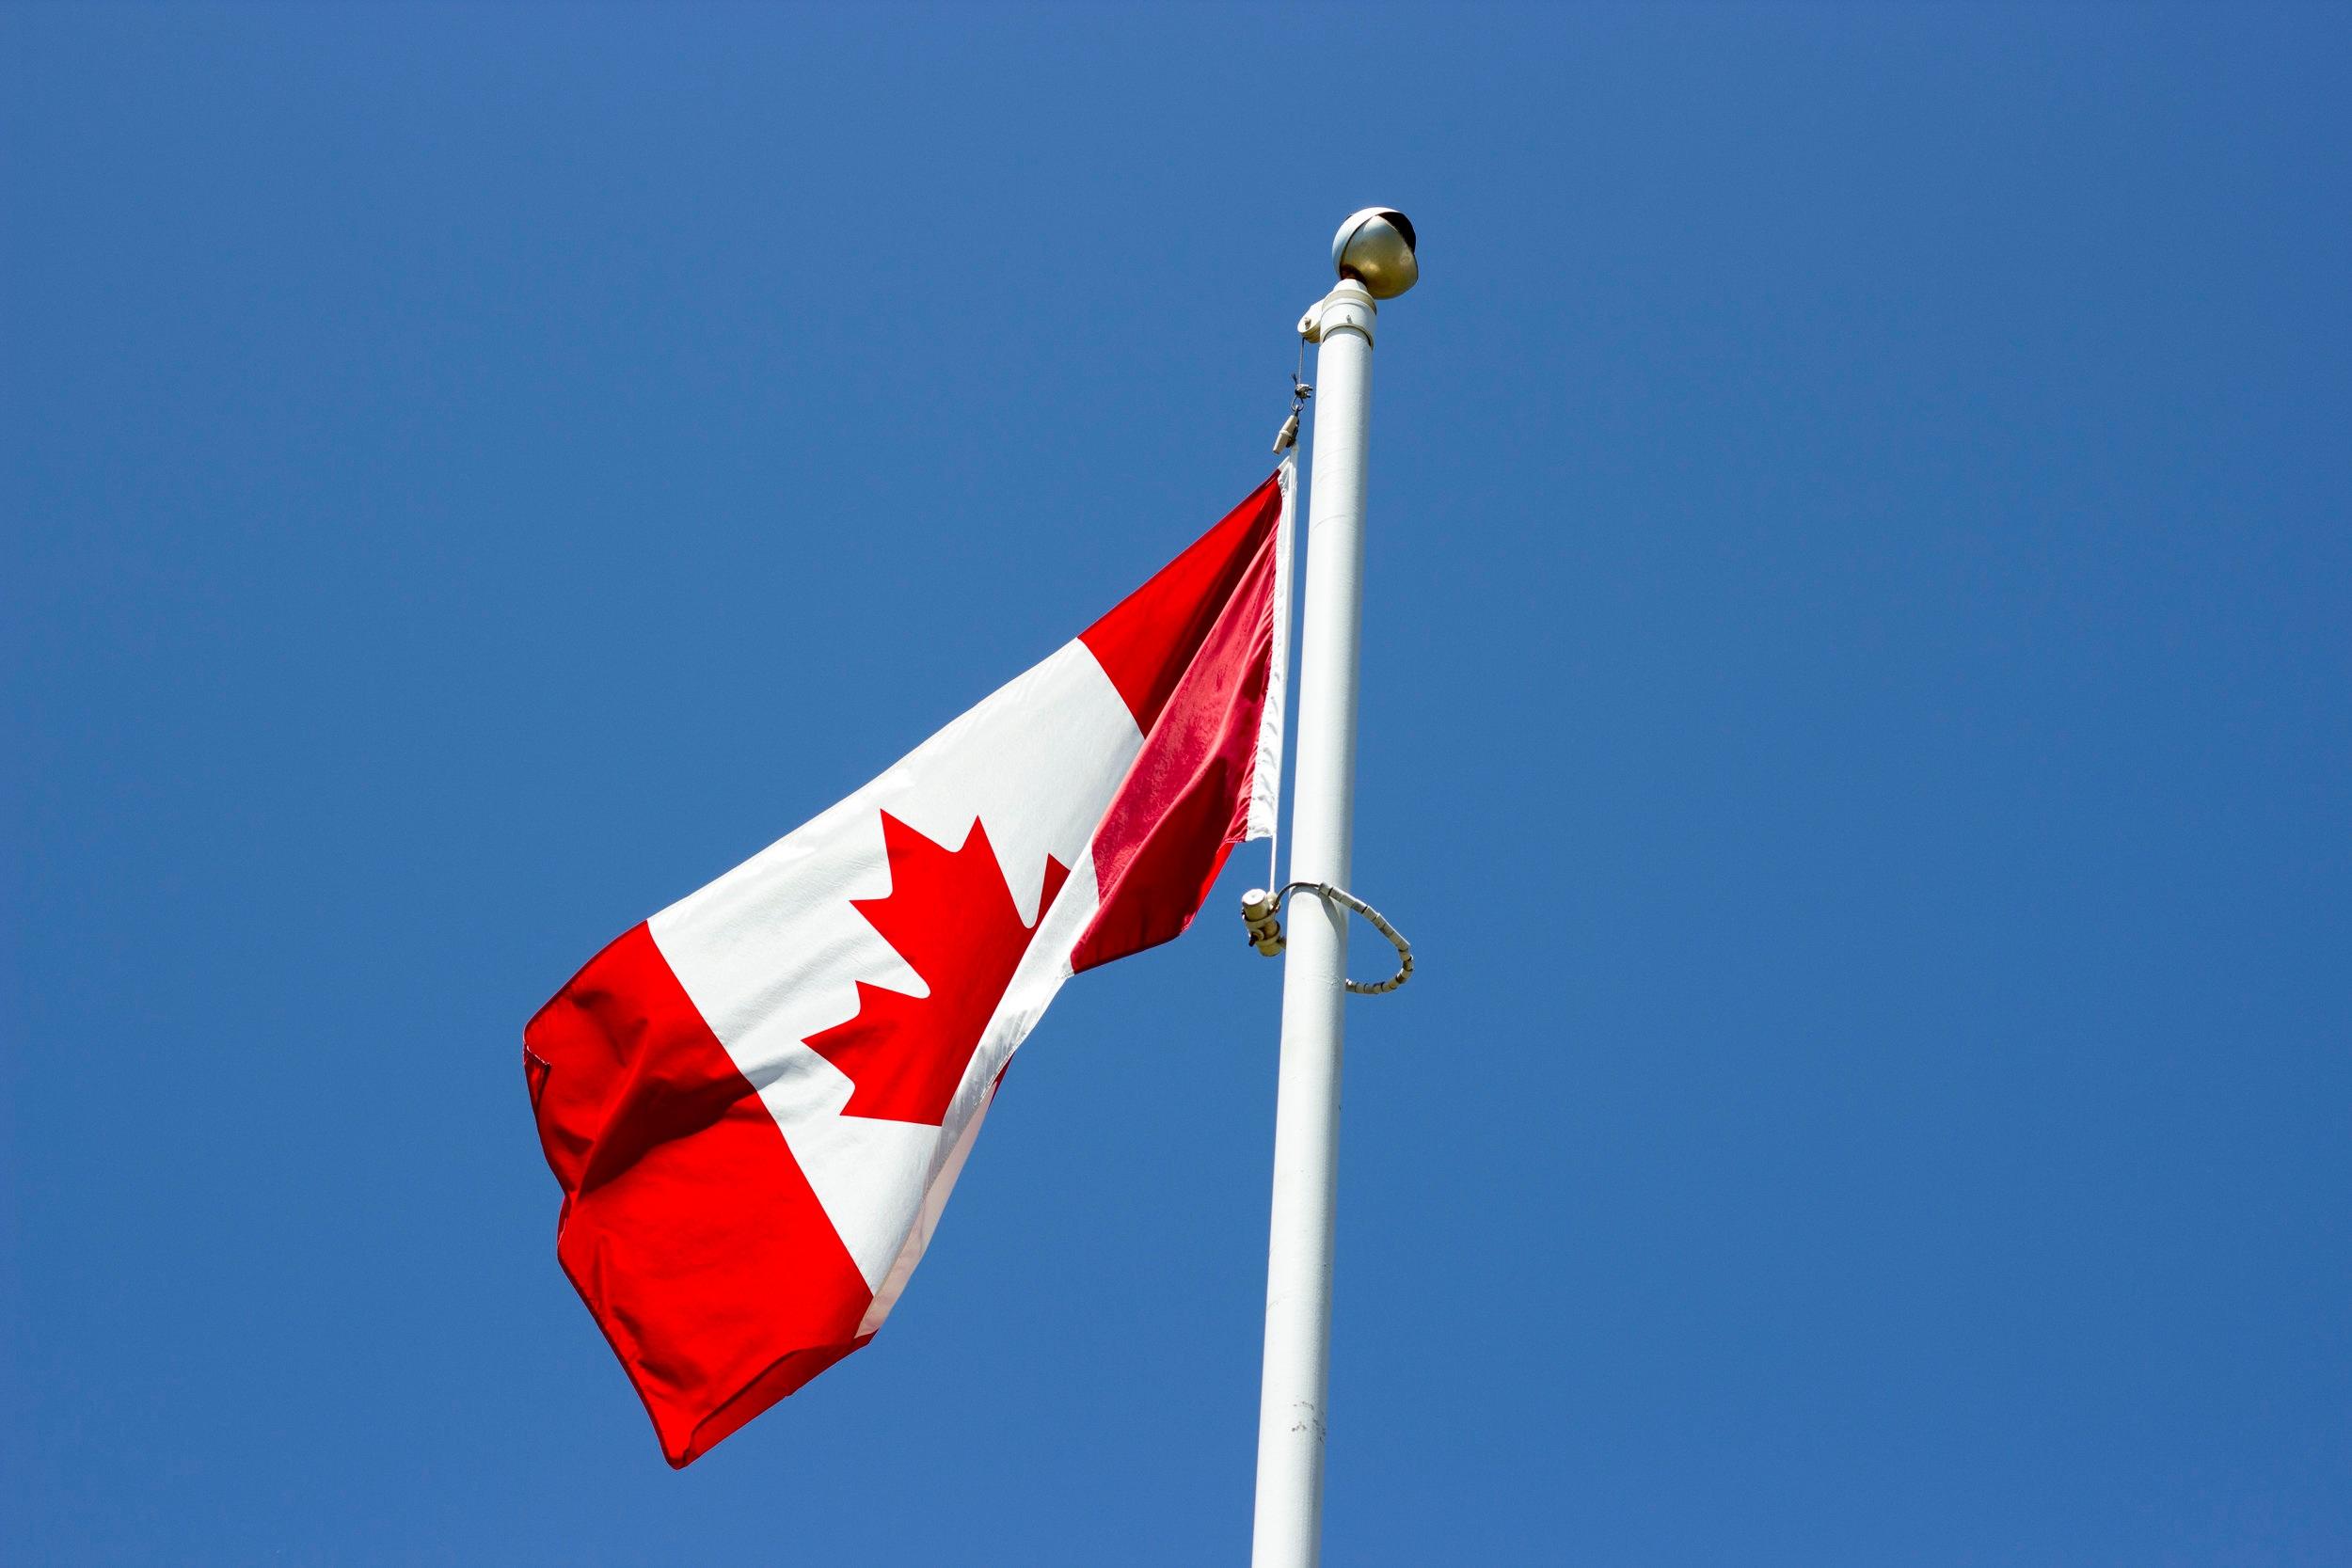 Canada - Building Lasting Partnerships to Establish Long-Term Resiliency